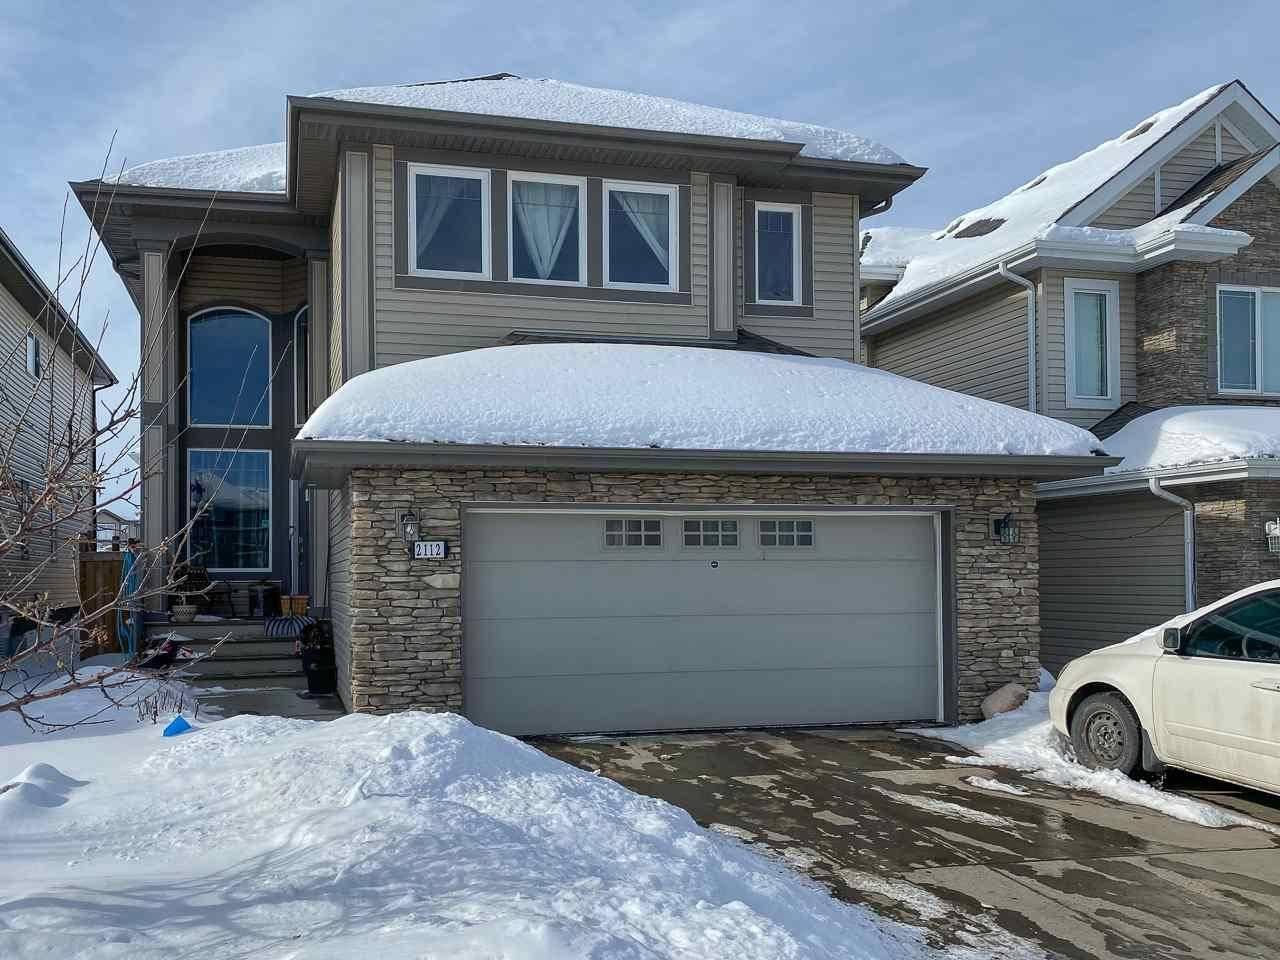 House for sale at 2112 68 St Sw Edmonton Alberta - MLS: E4188350